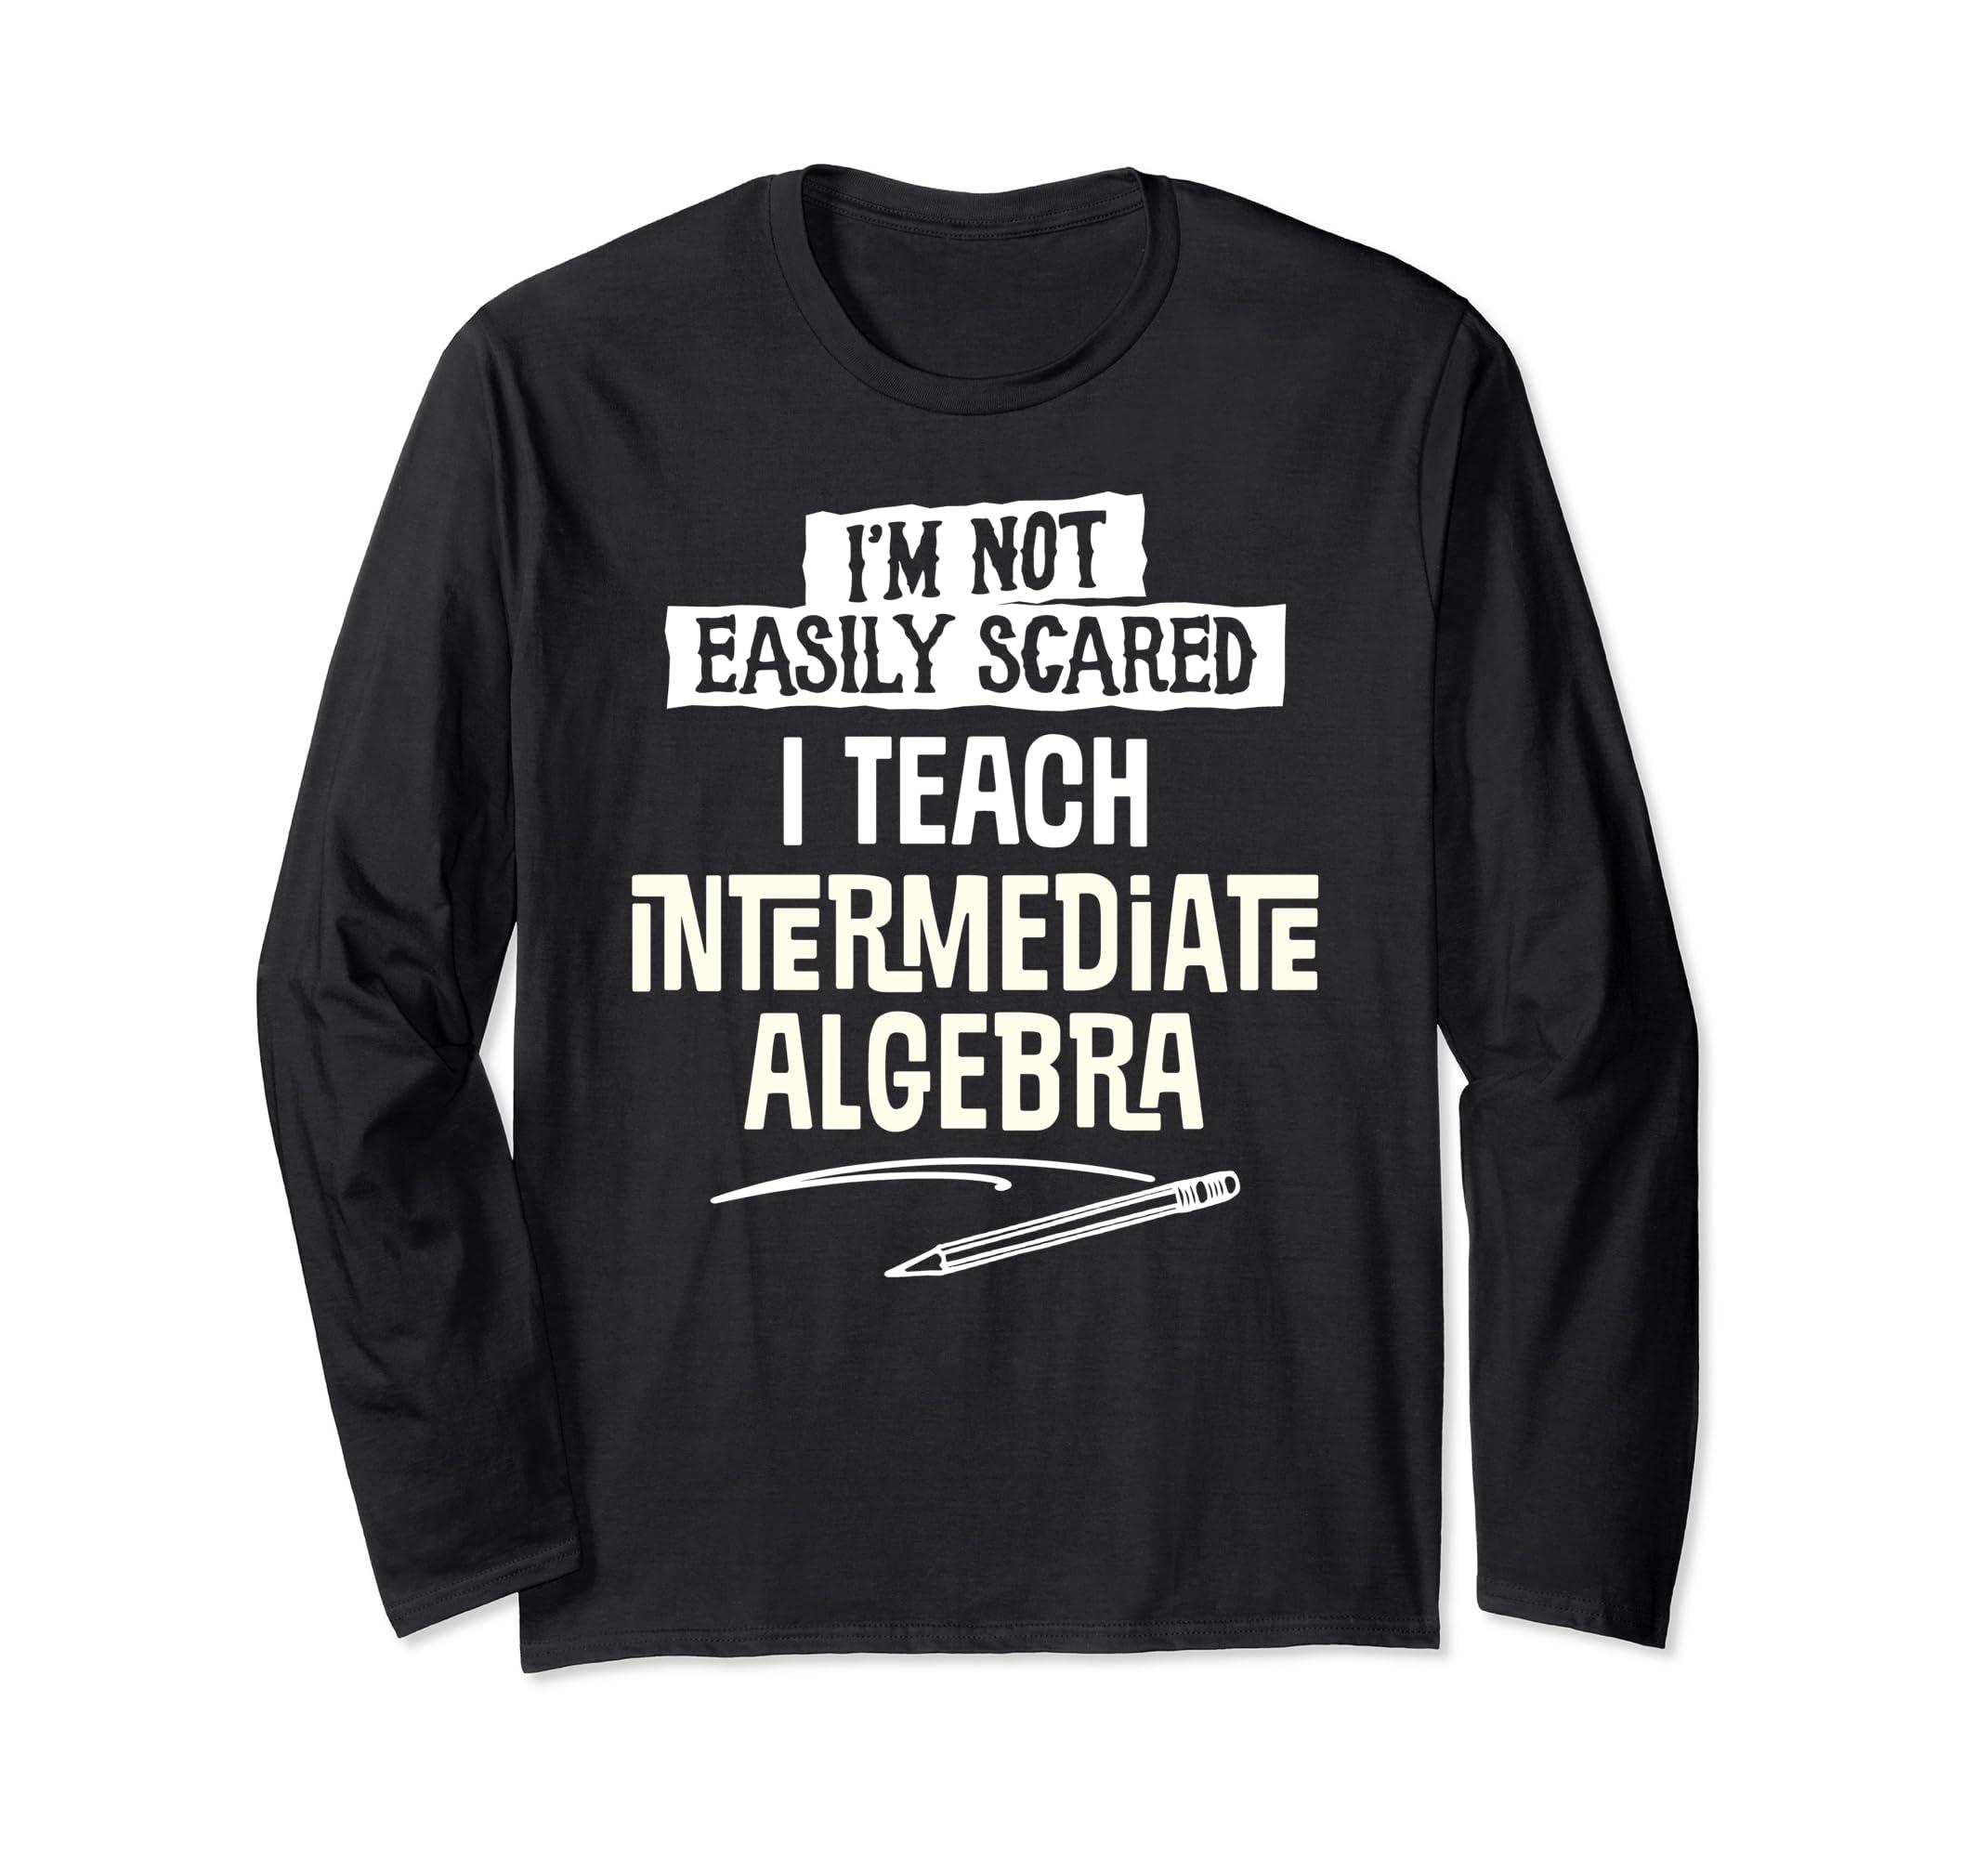 Funny Intermediate Algebra Teacher Halloween Long Sleeve Cos-Bawle